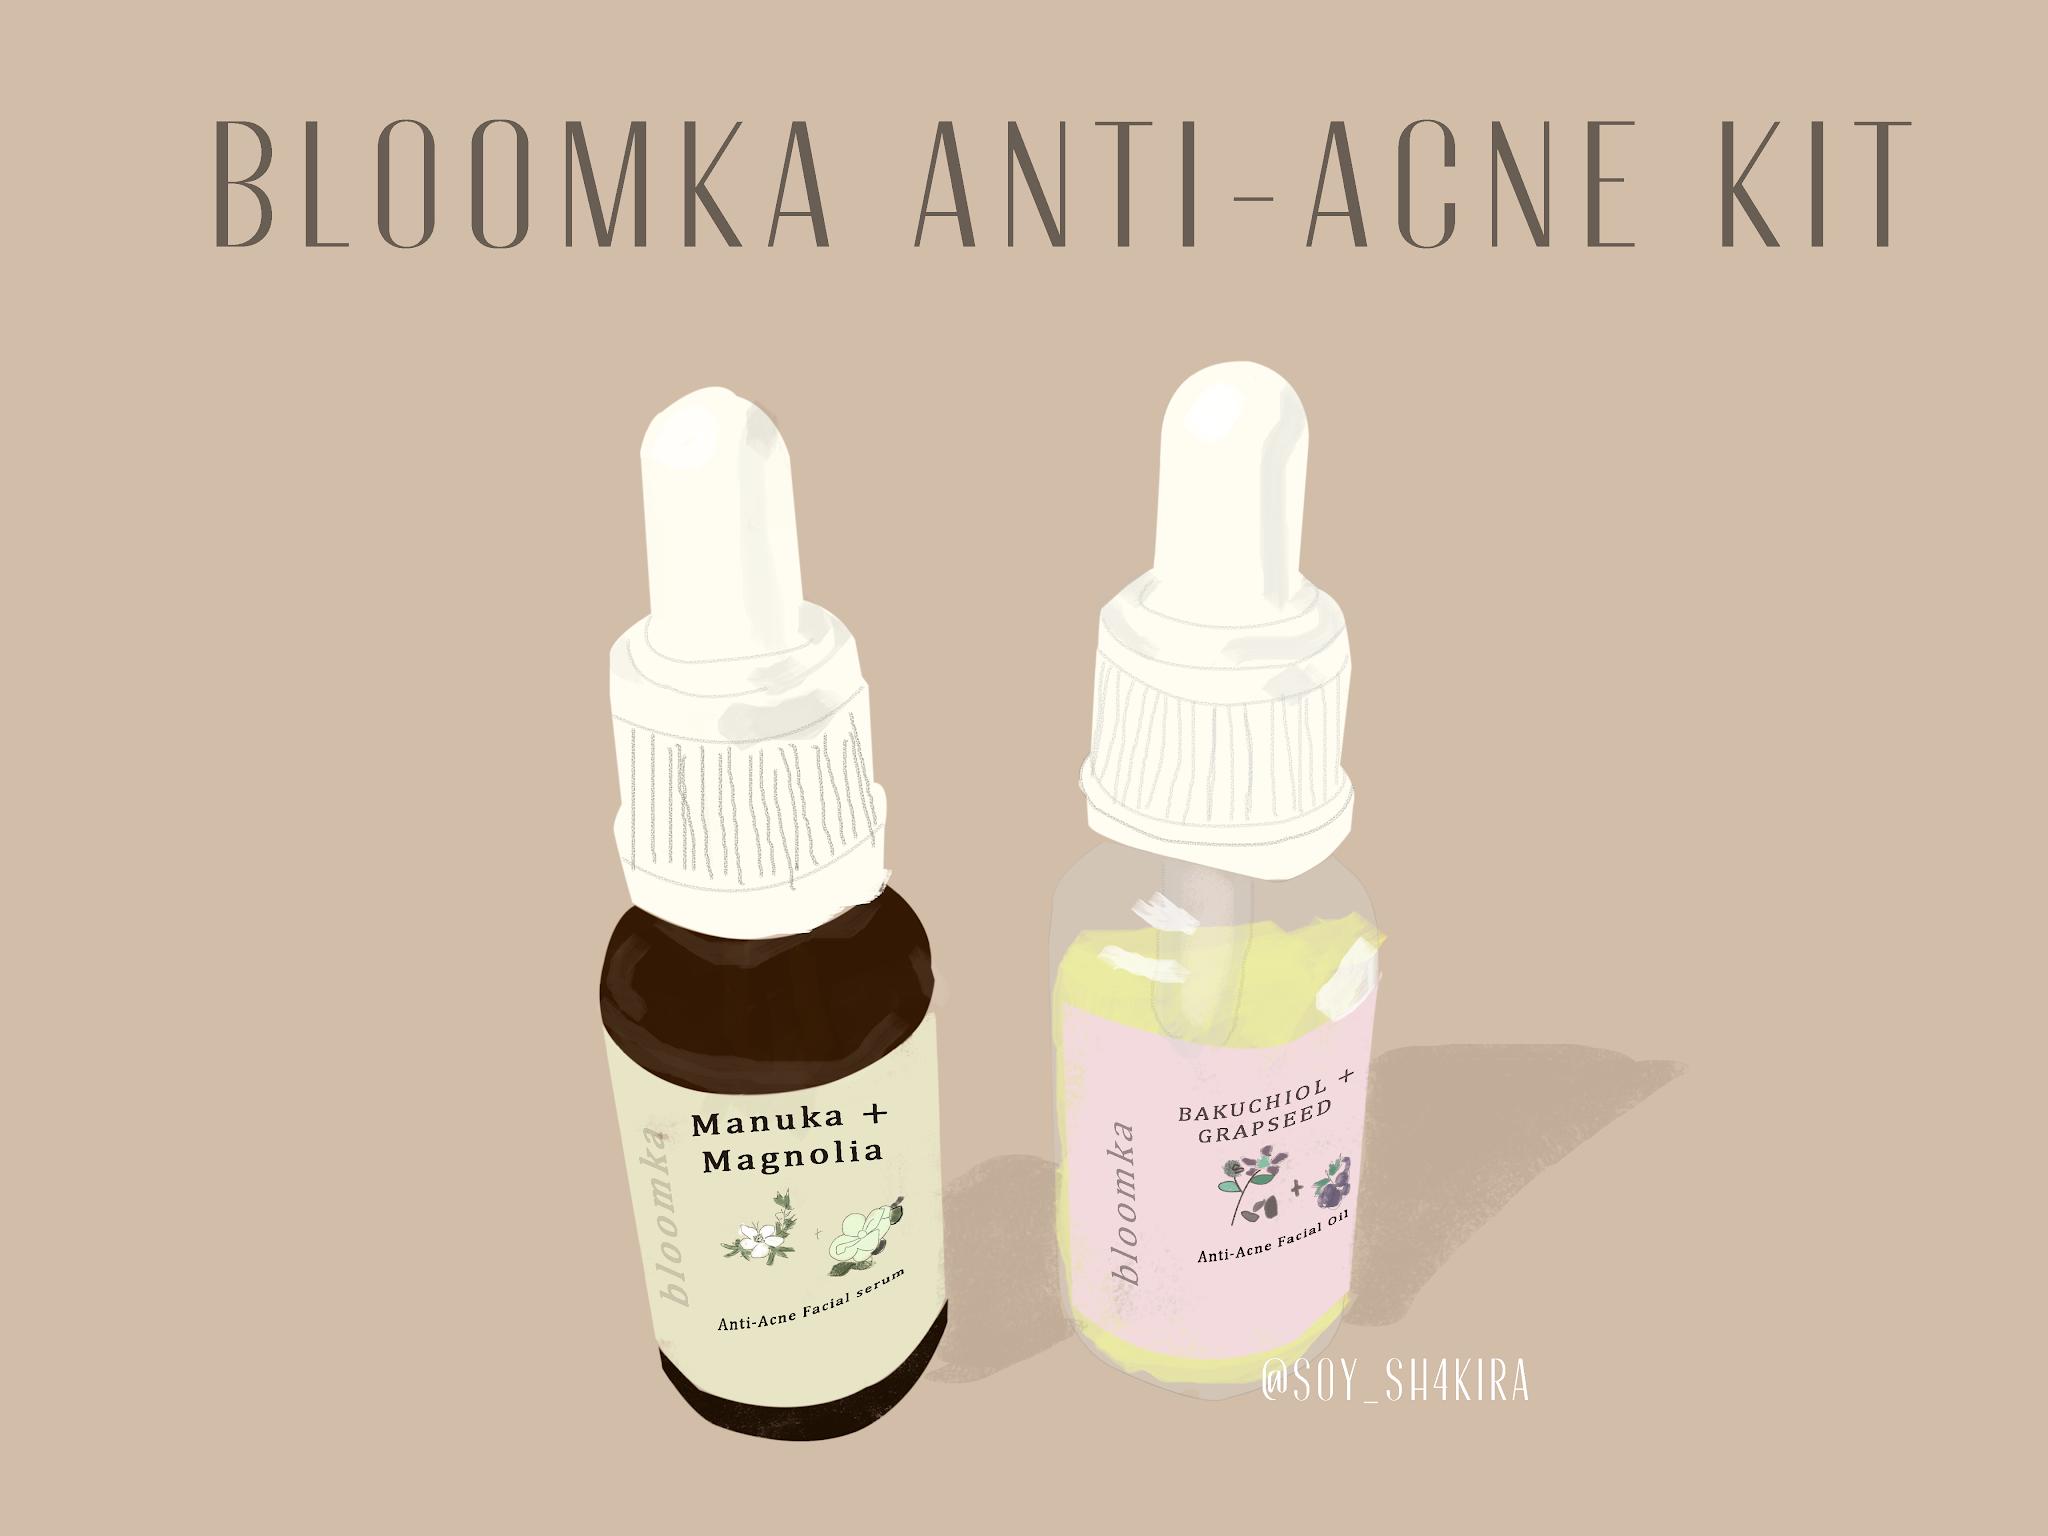 Bloomka Anti-Acne Kit